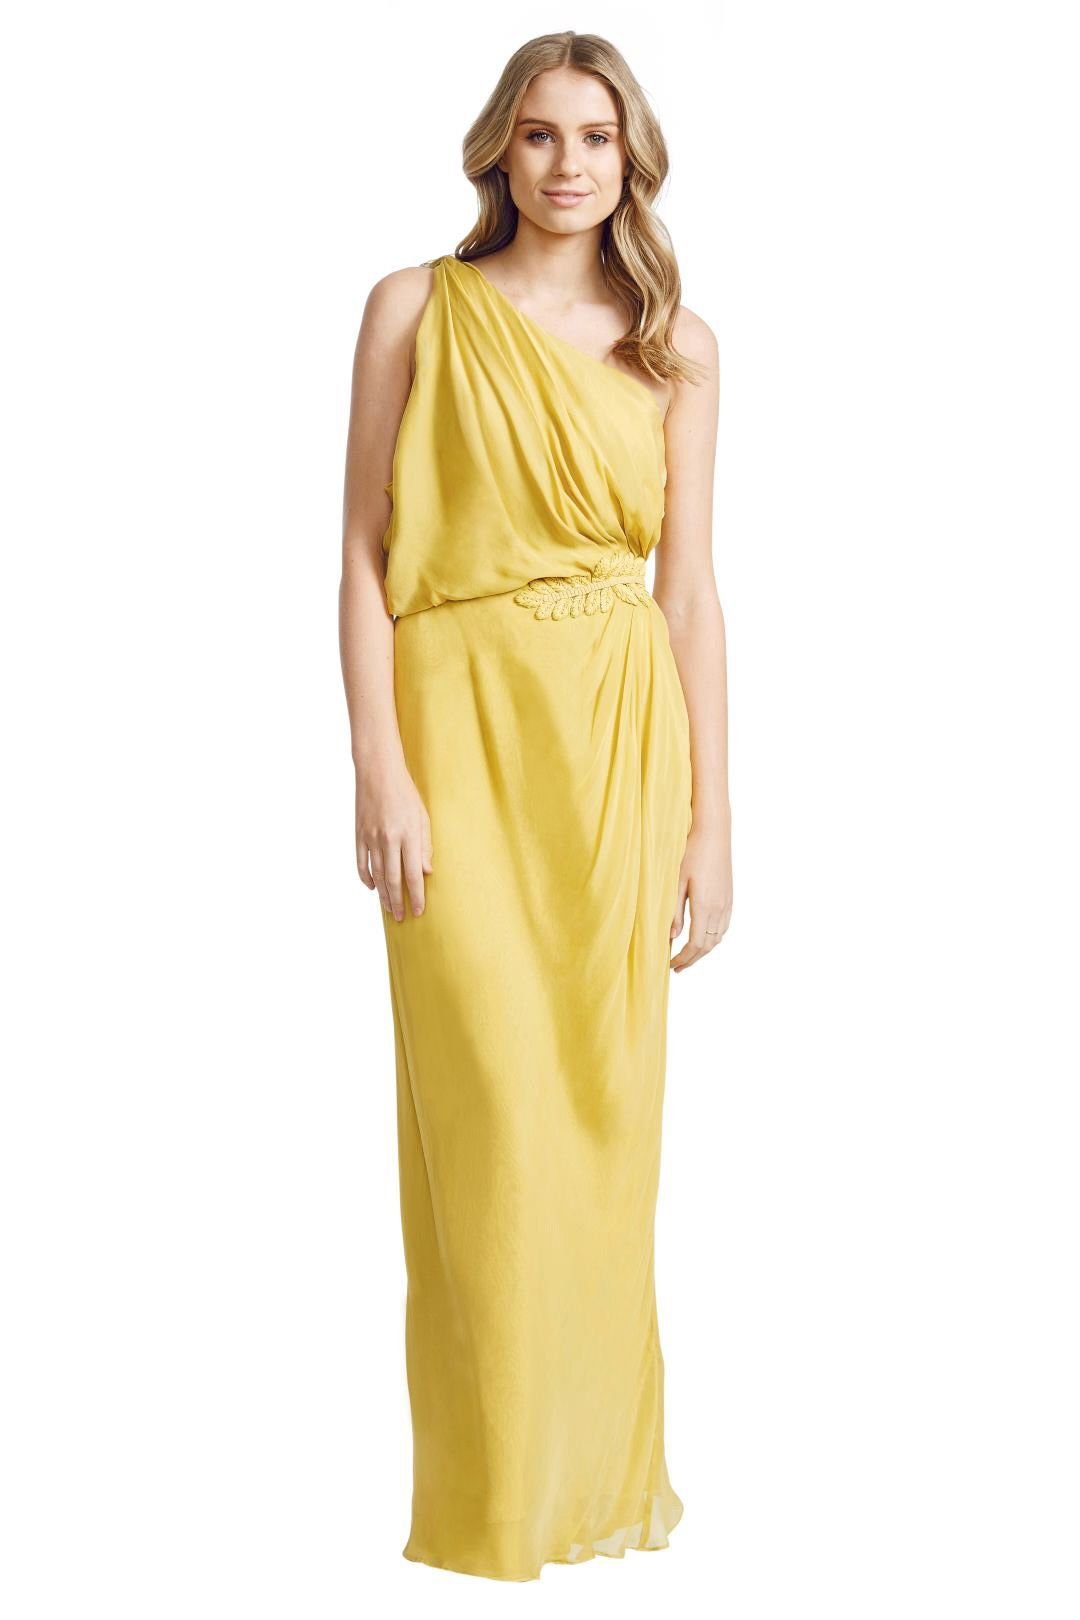 Aurelio Costarella - Athene Gown - Yellow - Front